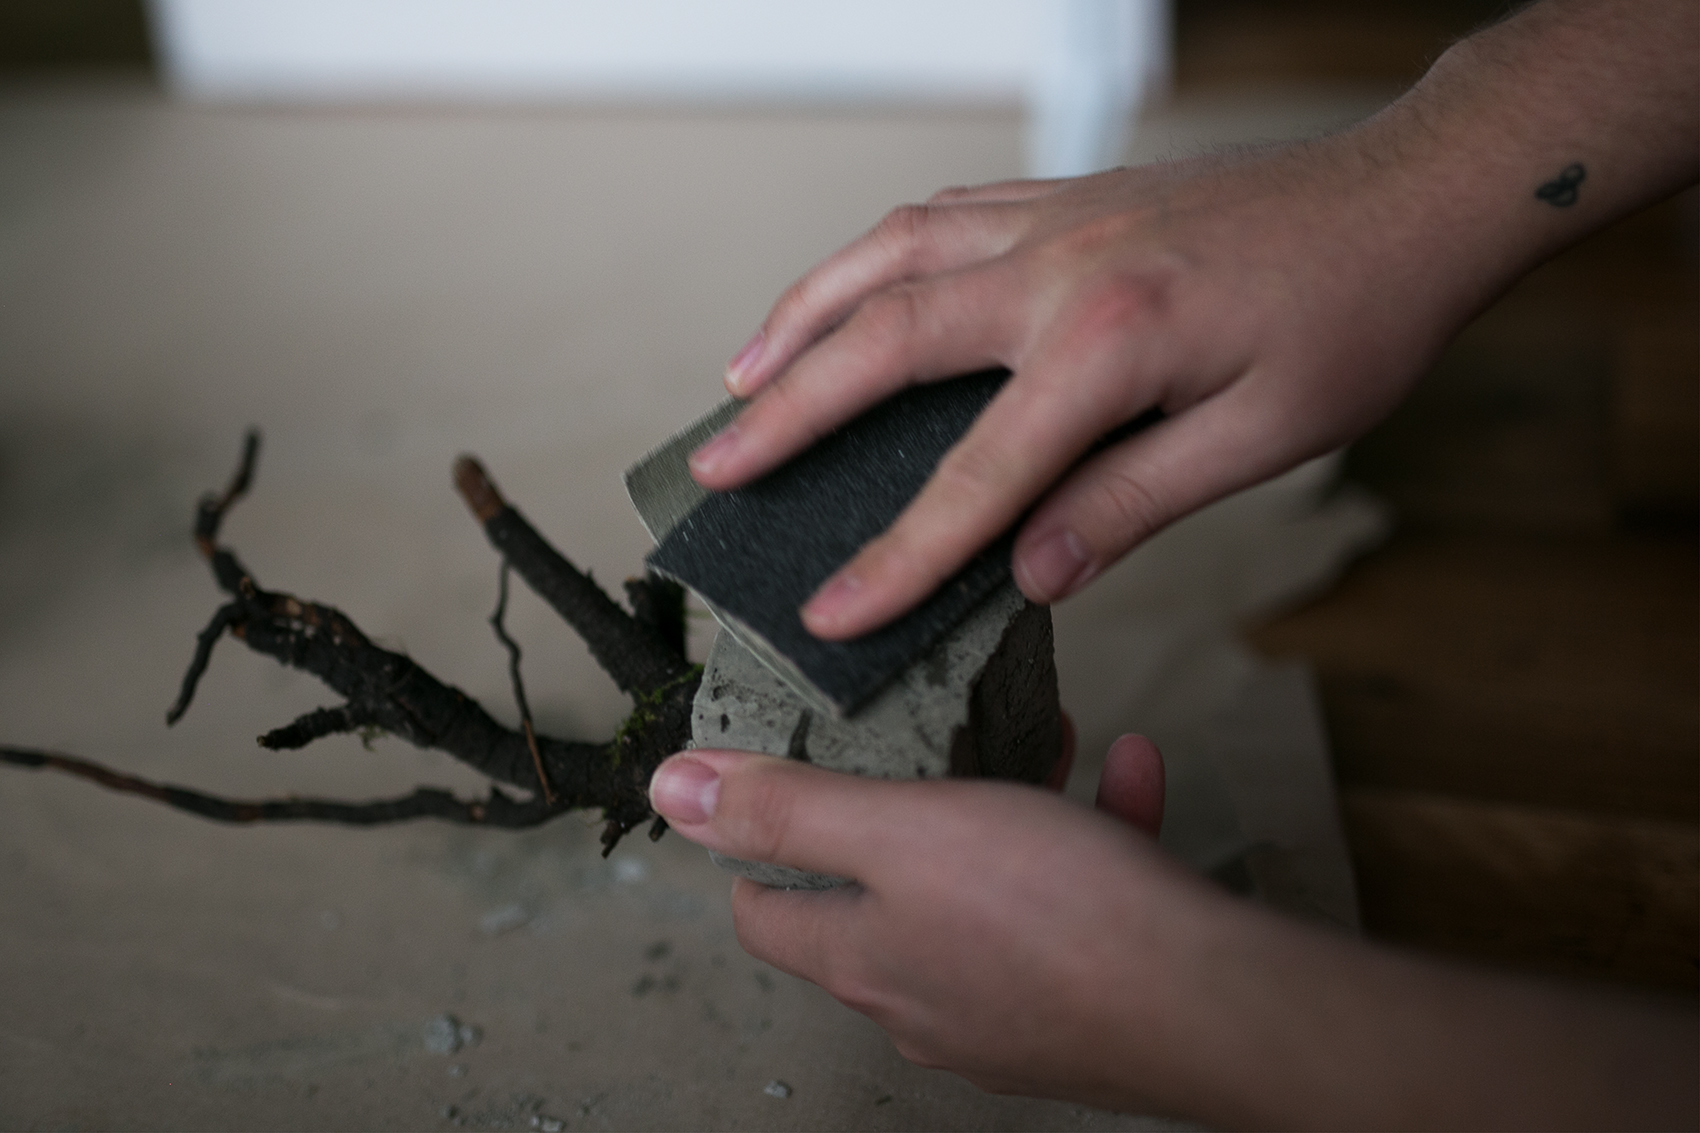 Beton Baum DIY Projekt abfeilen